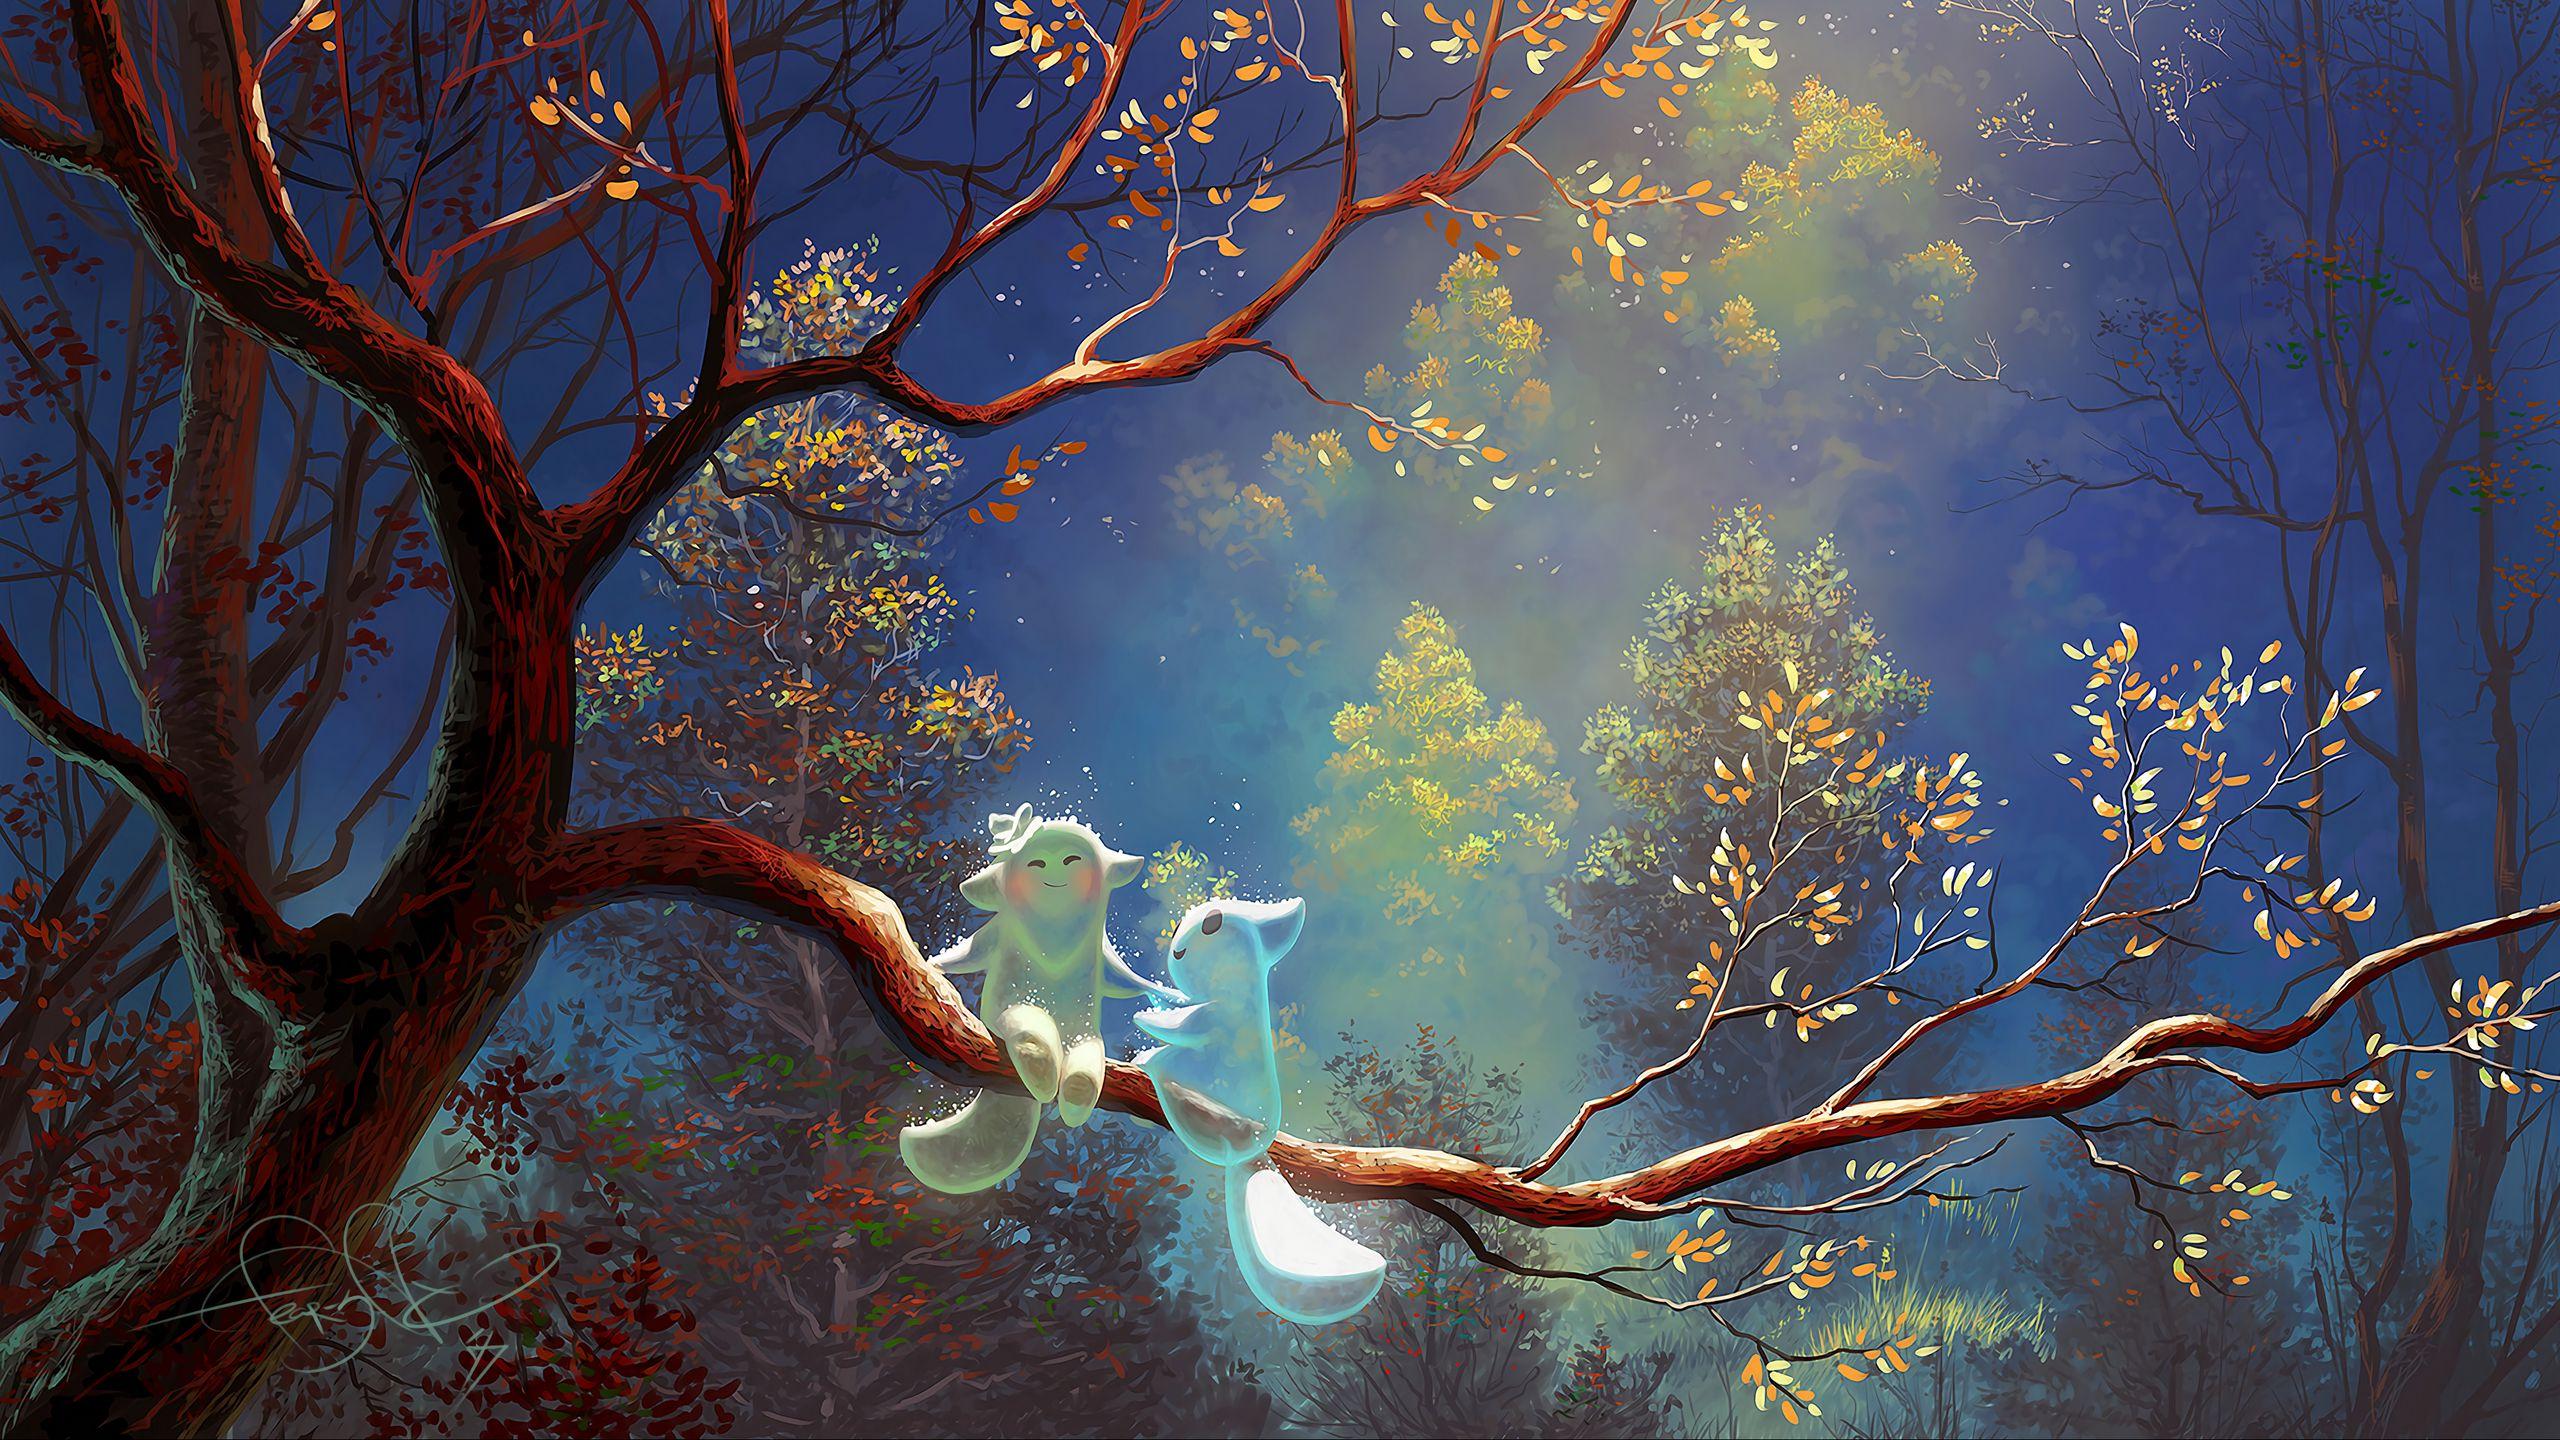 2560x1440 Wallpaper animals, tree, branch, magic, art, fantasy